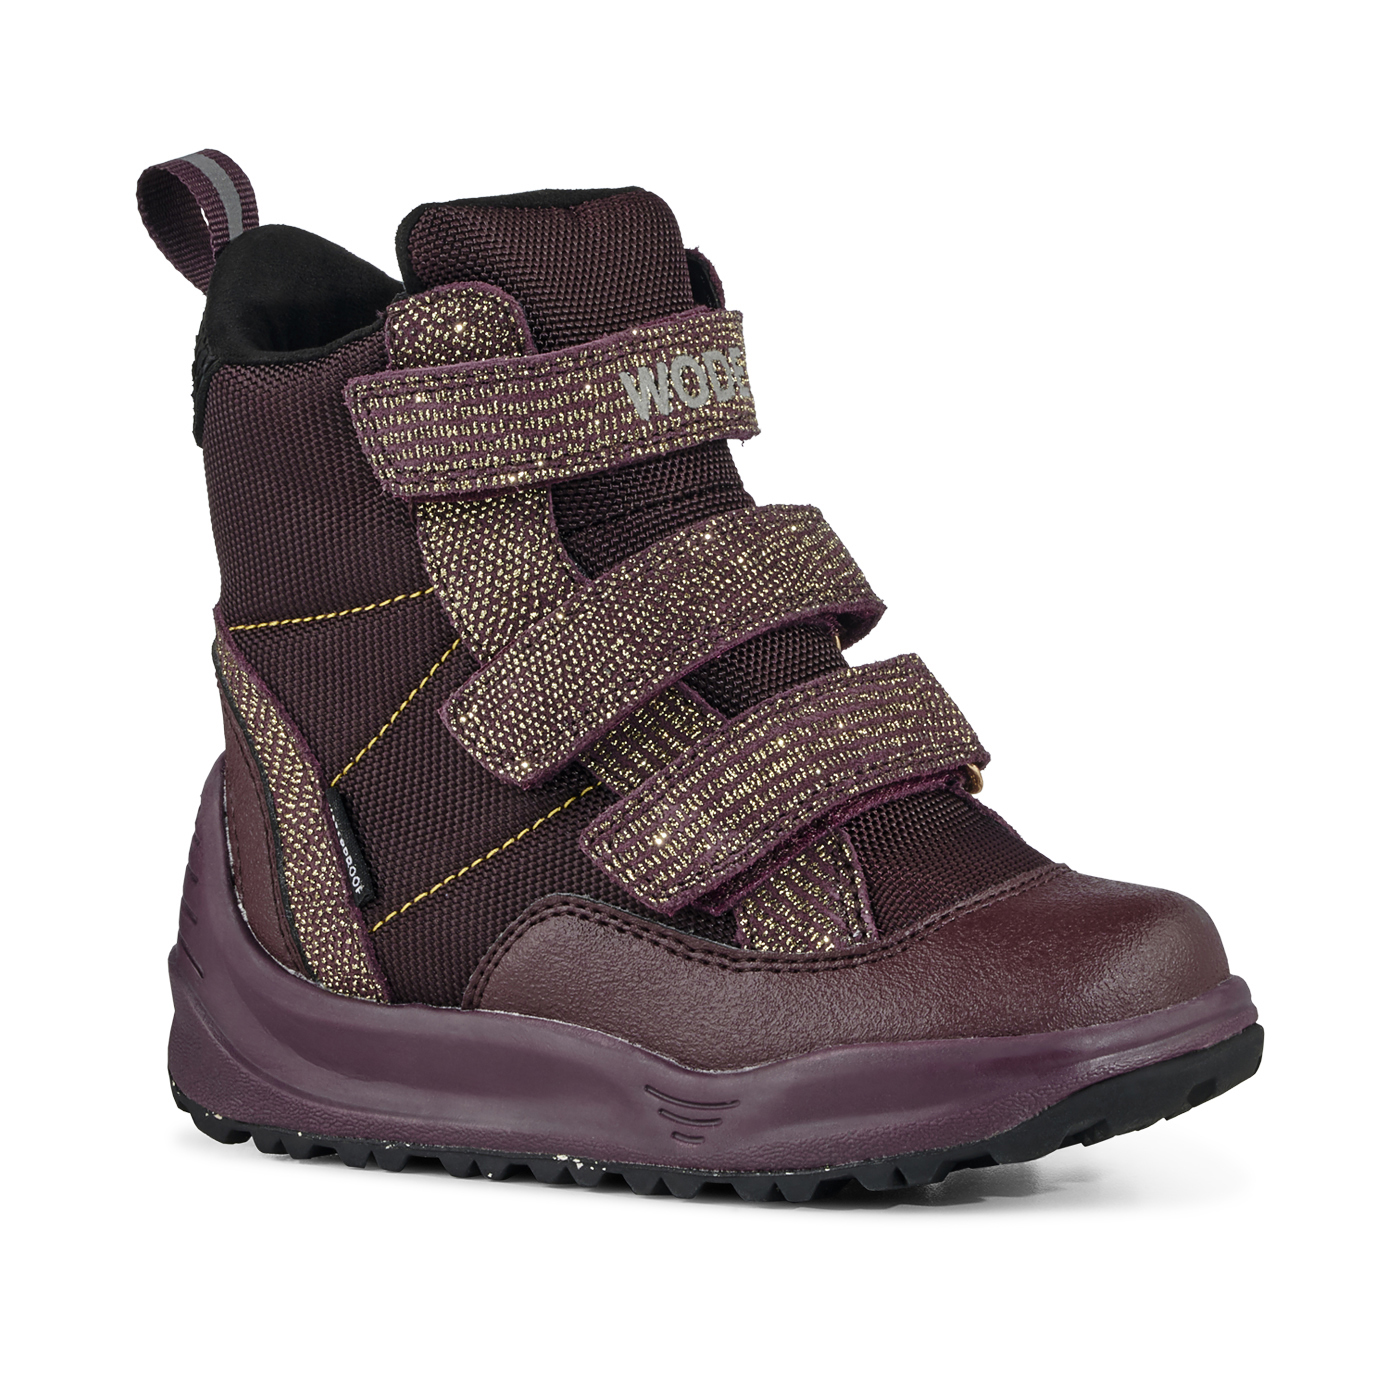 Woden WK9053 Boots 27 780